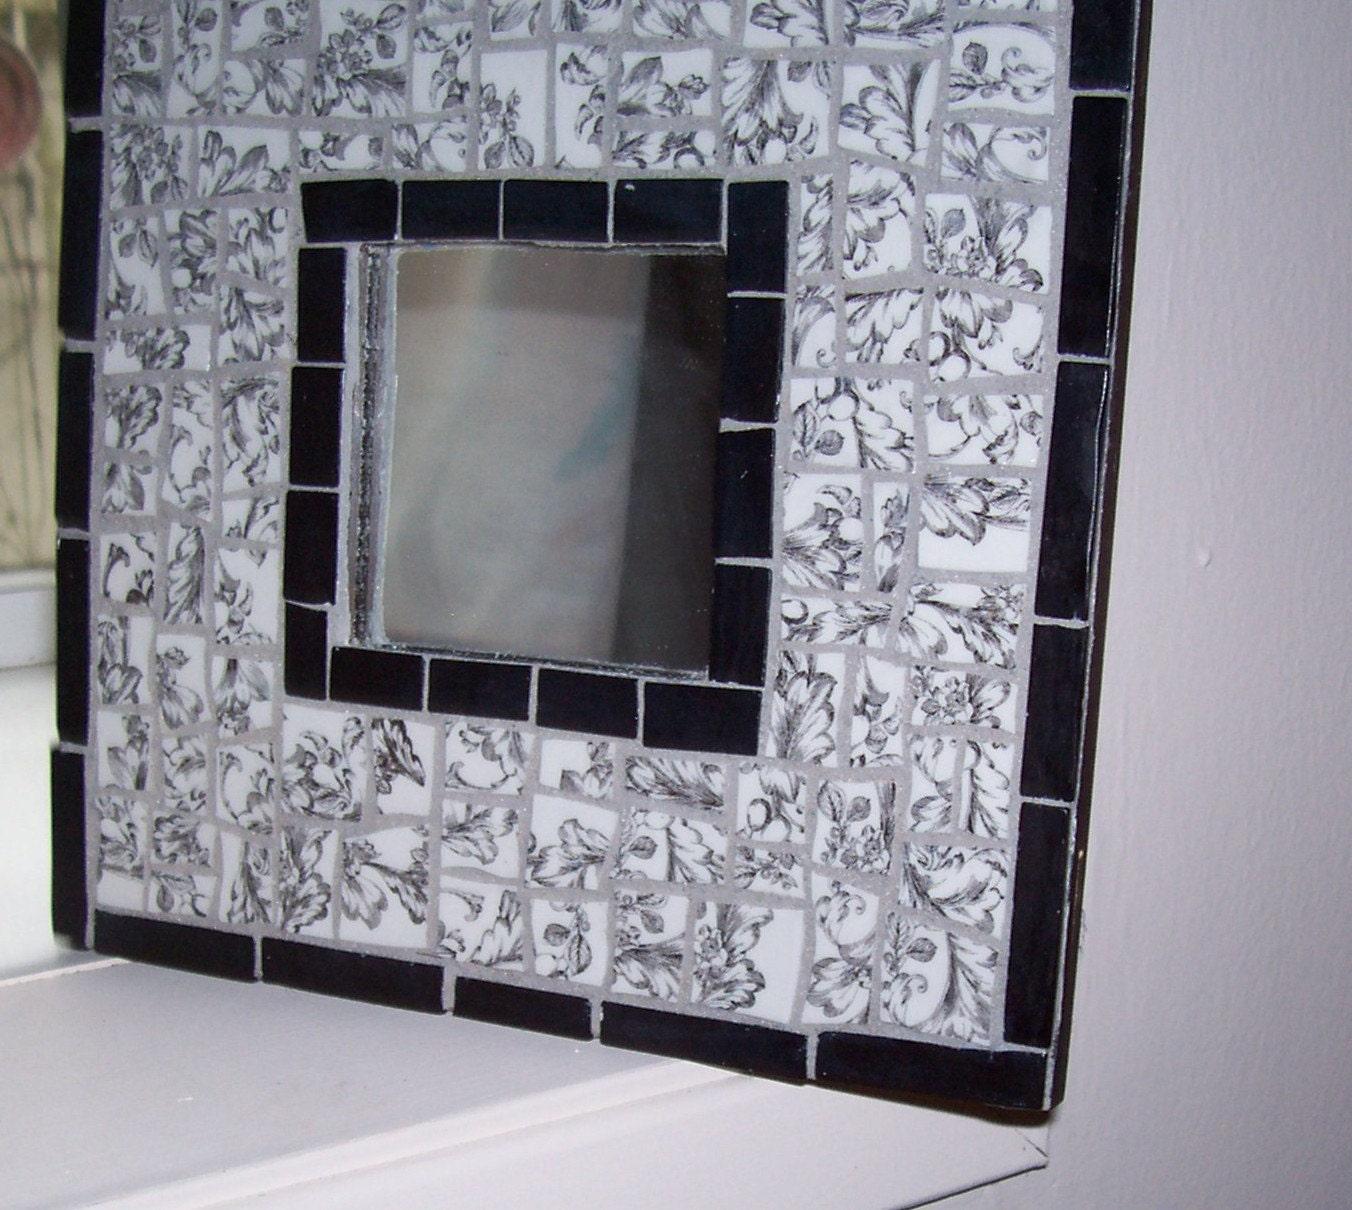 mosaic mirror black and white broken china mirror wall. Black Bedroom Furniture Sets. Home Design Ideas